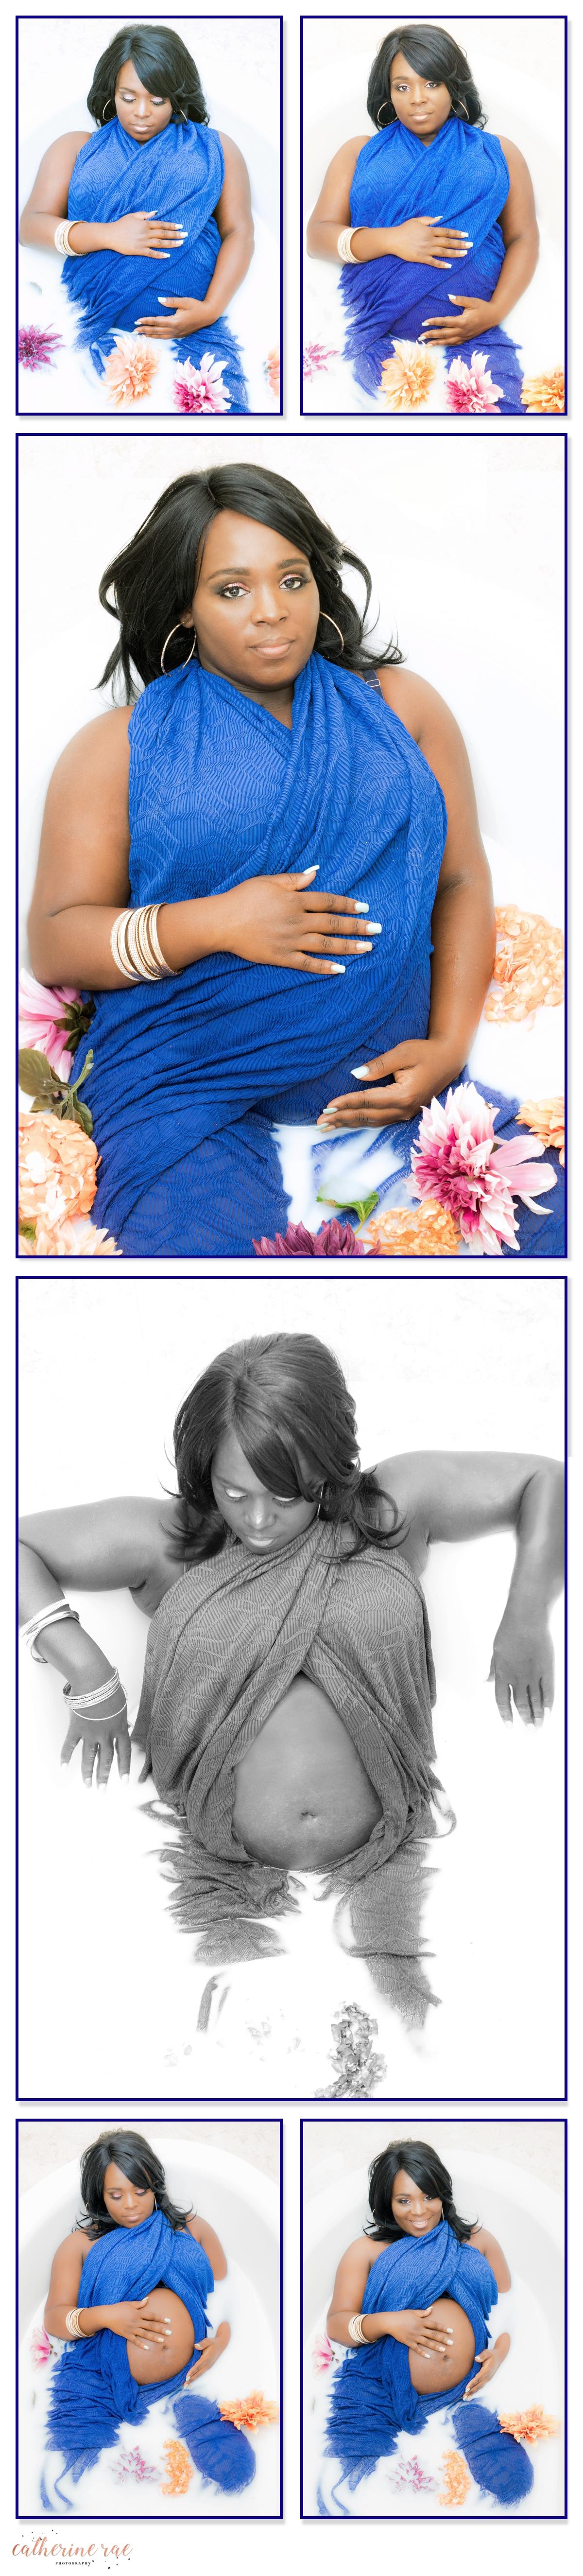 Jamika_Maternity_Portraits_ 2.jpg